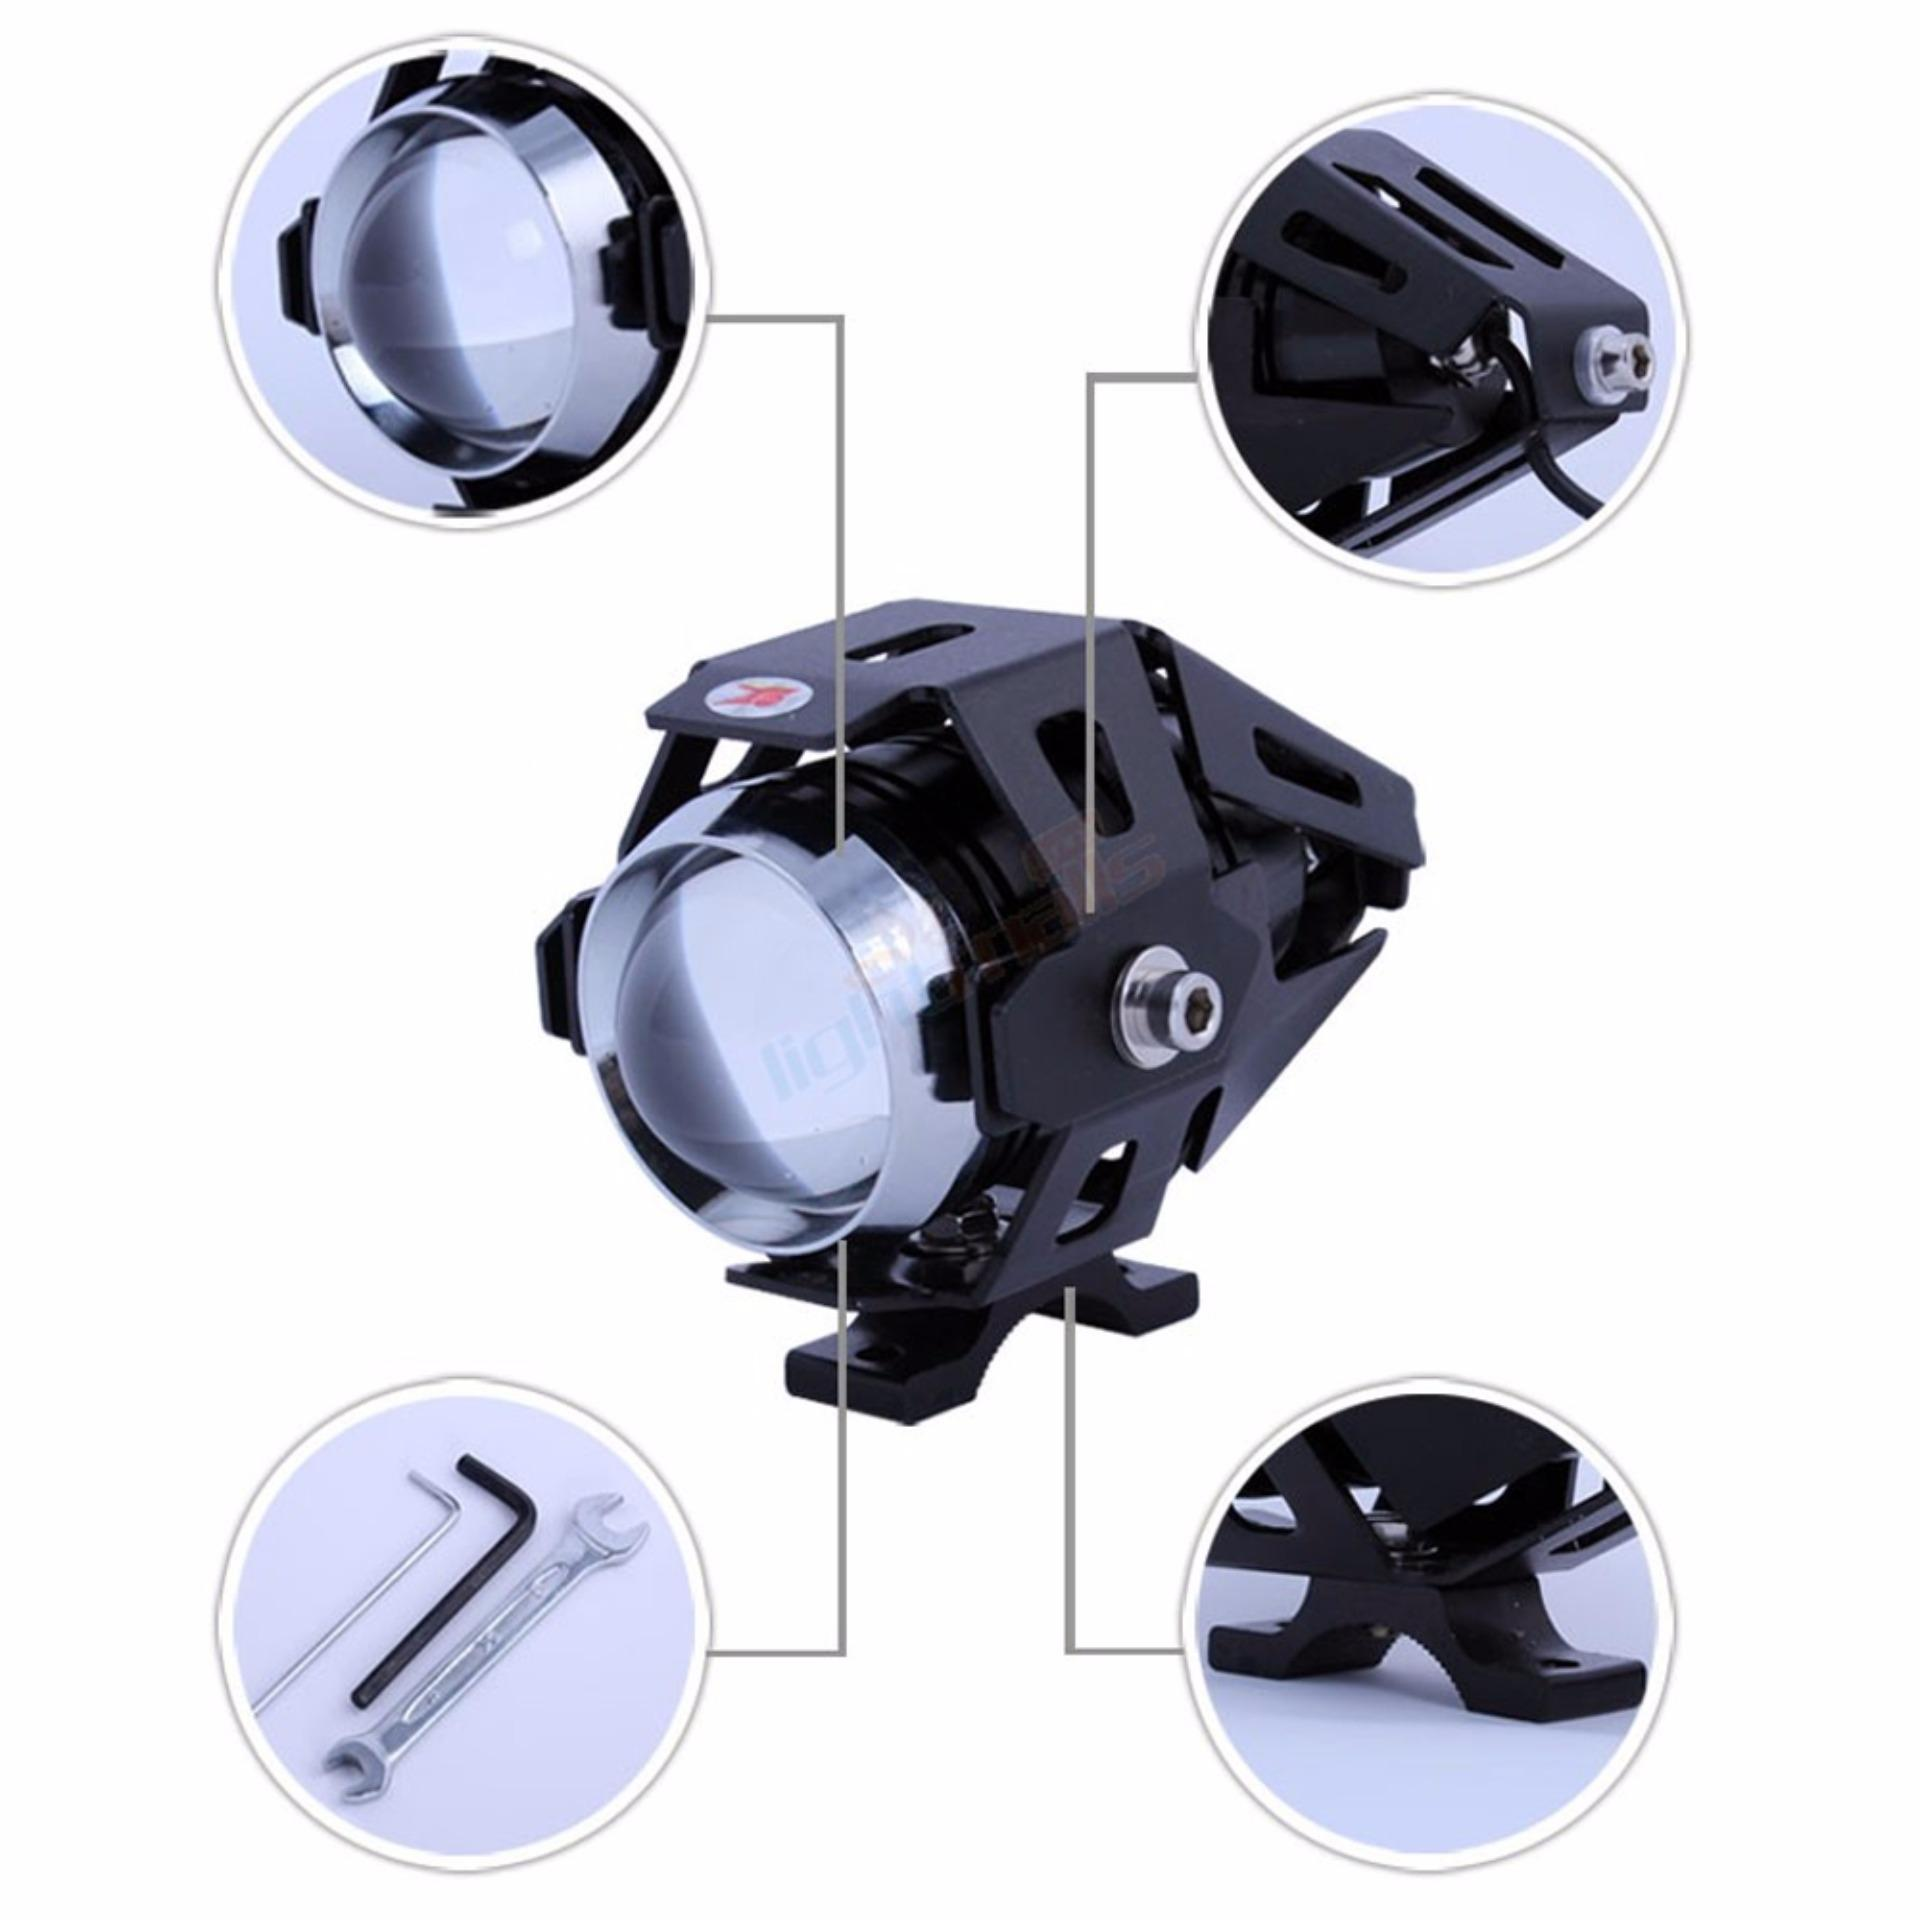 Harga Terendah New Lampu Motor Transformer Sorot Led Tembak Cree U5 Light Headlight 3000 Lumens Bergaransi